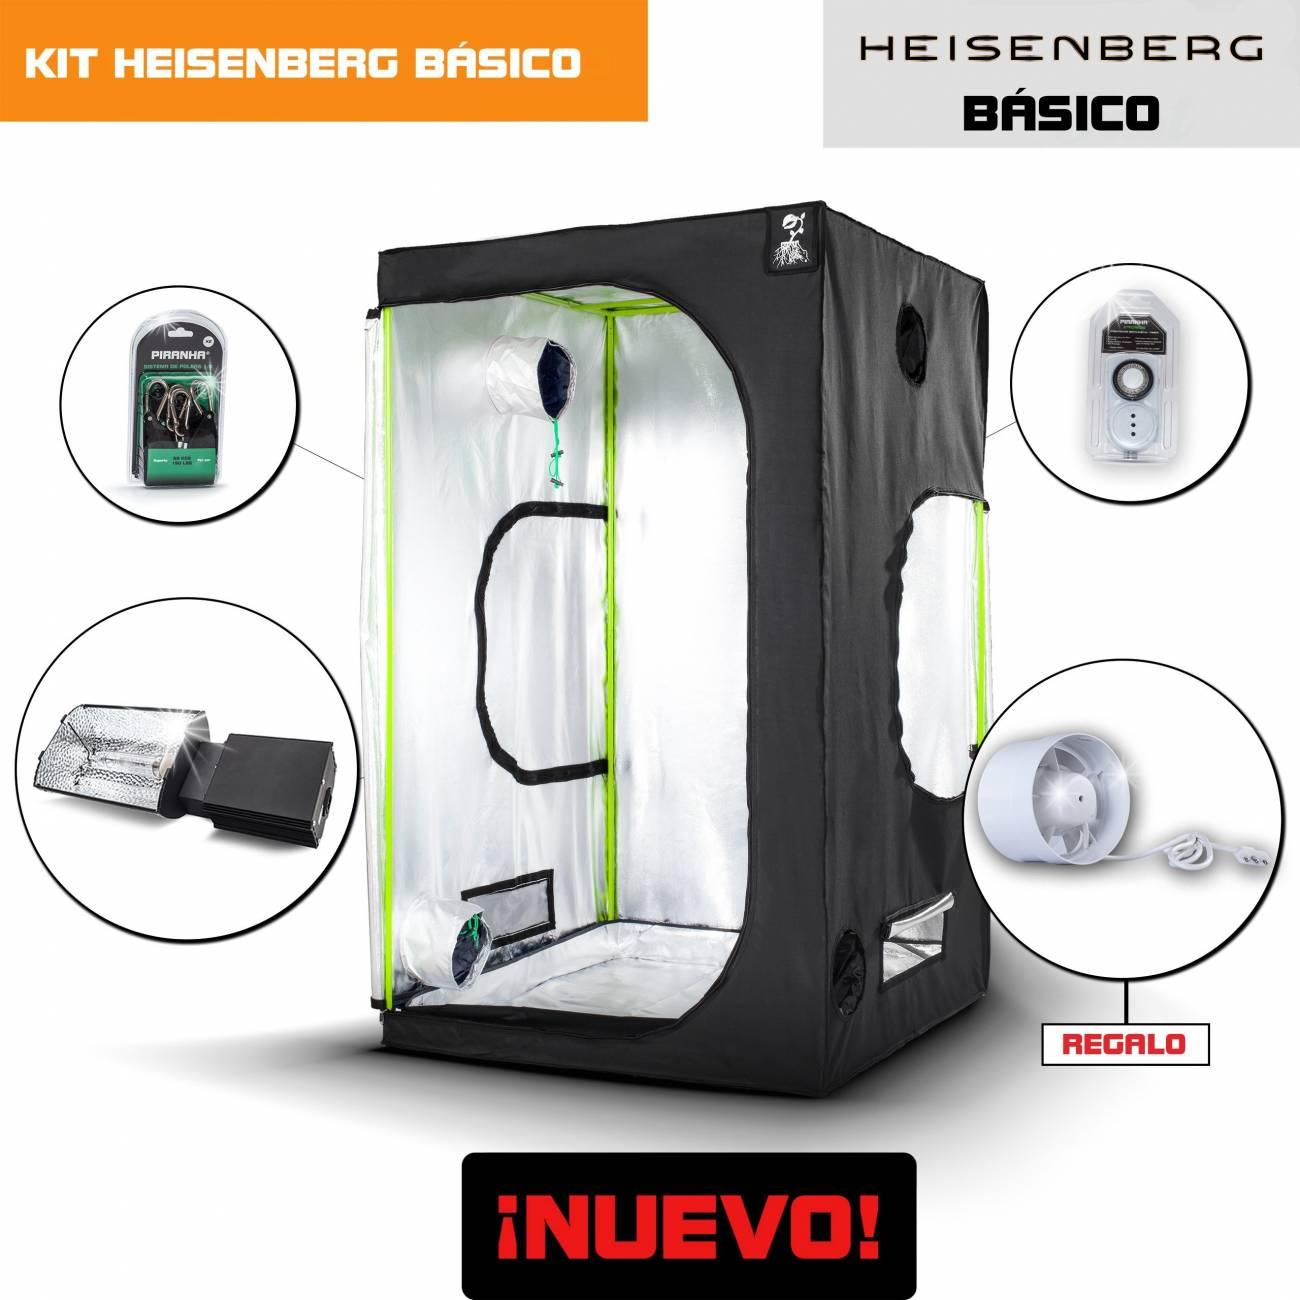 Kit CMH Heisenberg 120 - 315W Básico